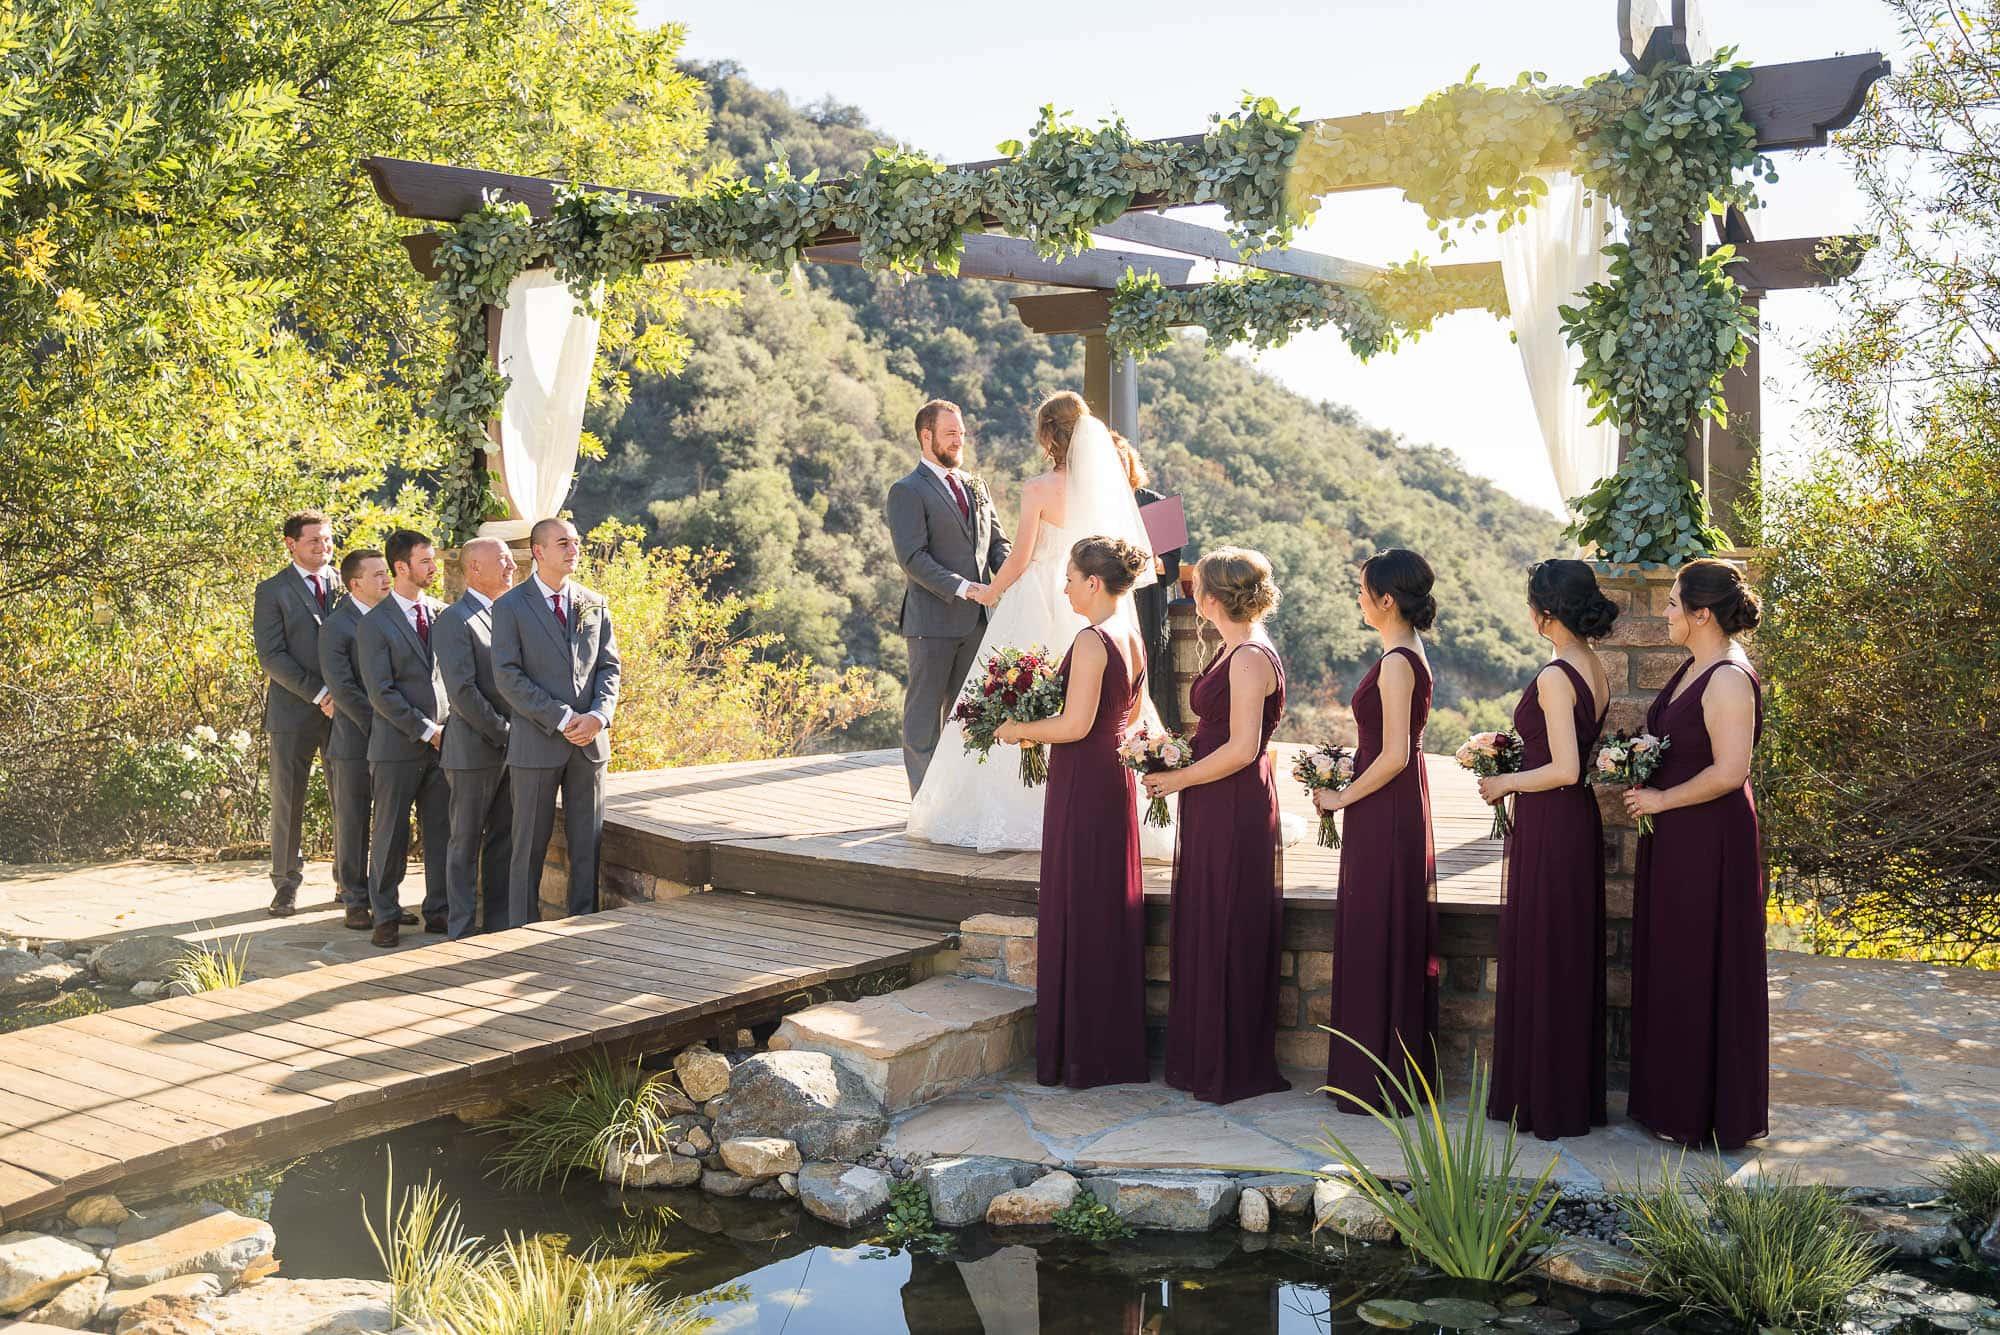 217_Alan_and_Heidi_Serendipity_Garden_Wedding_10-27-2018